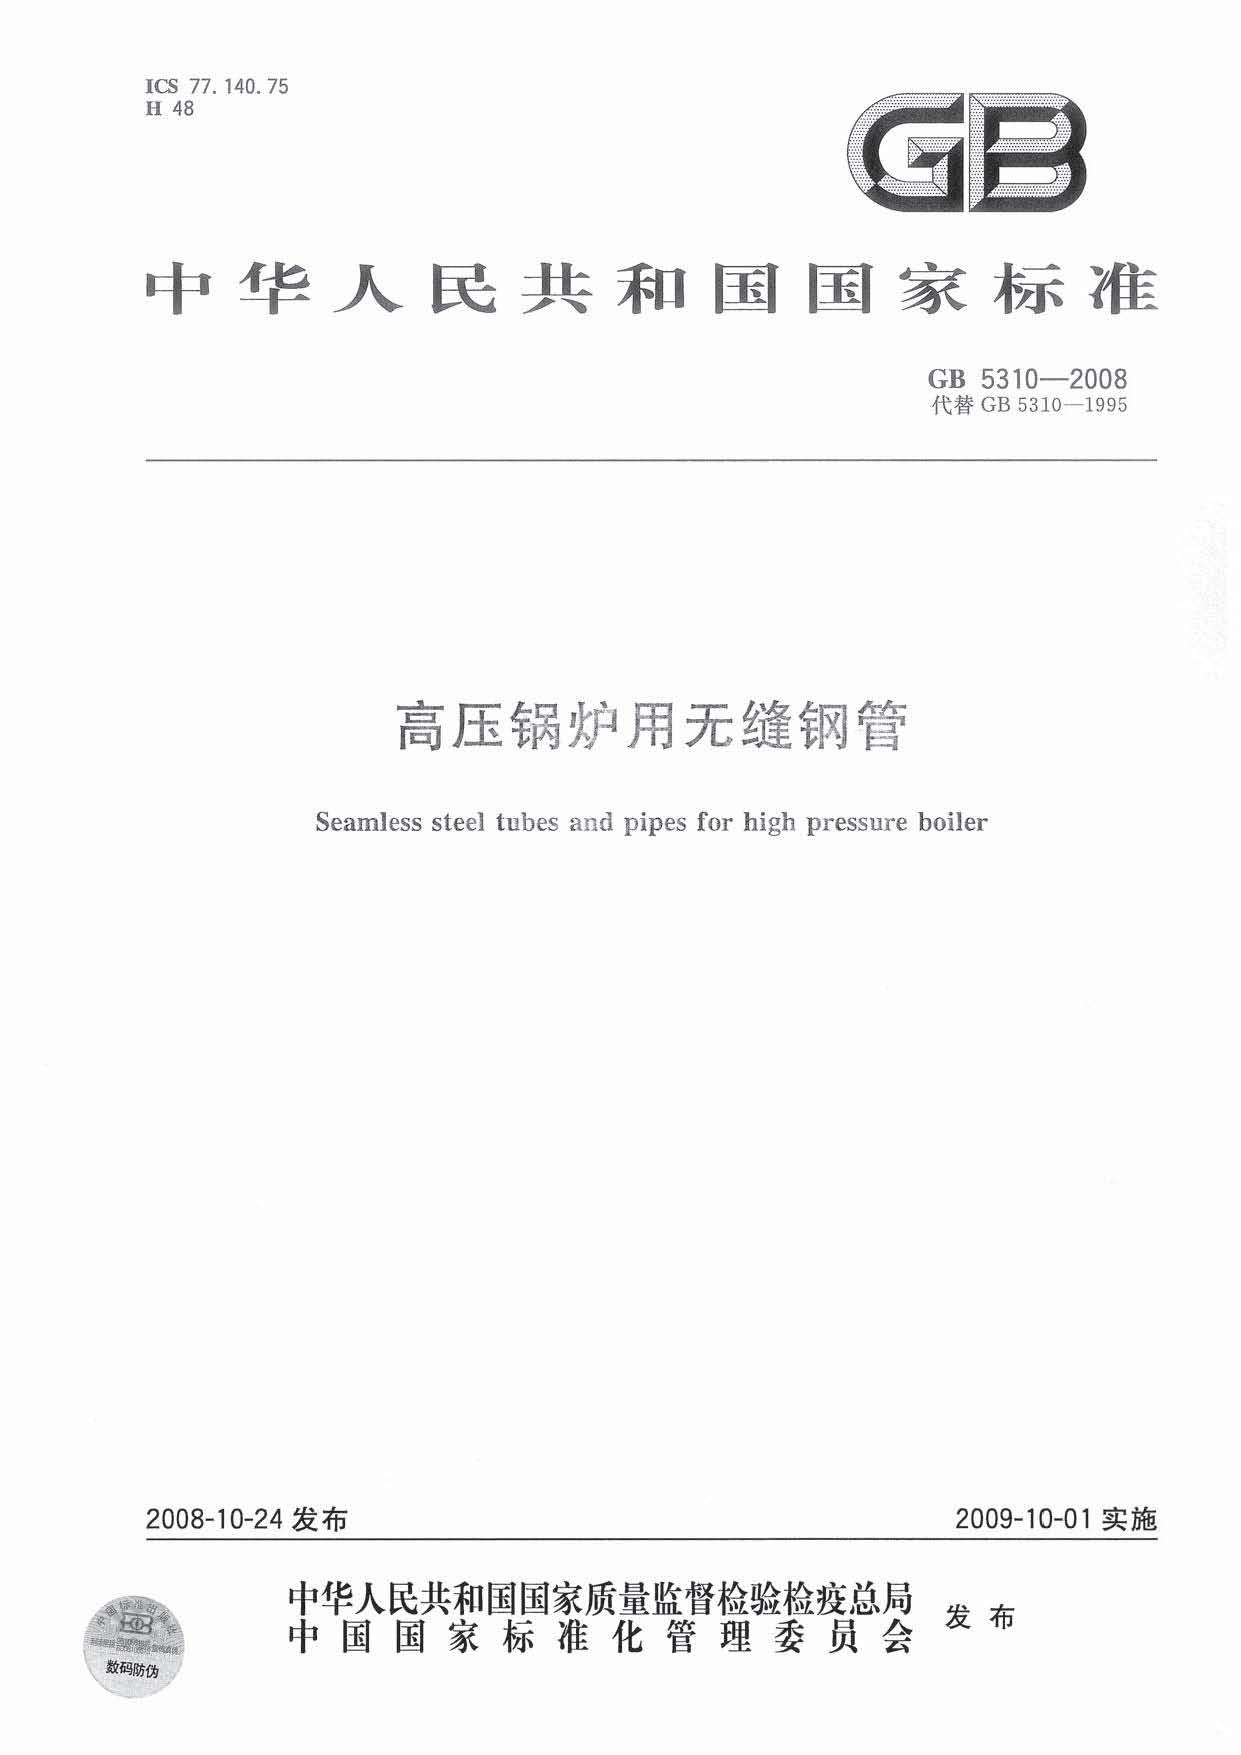 GB 5310-2008标准下载